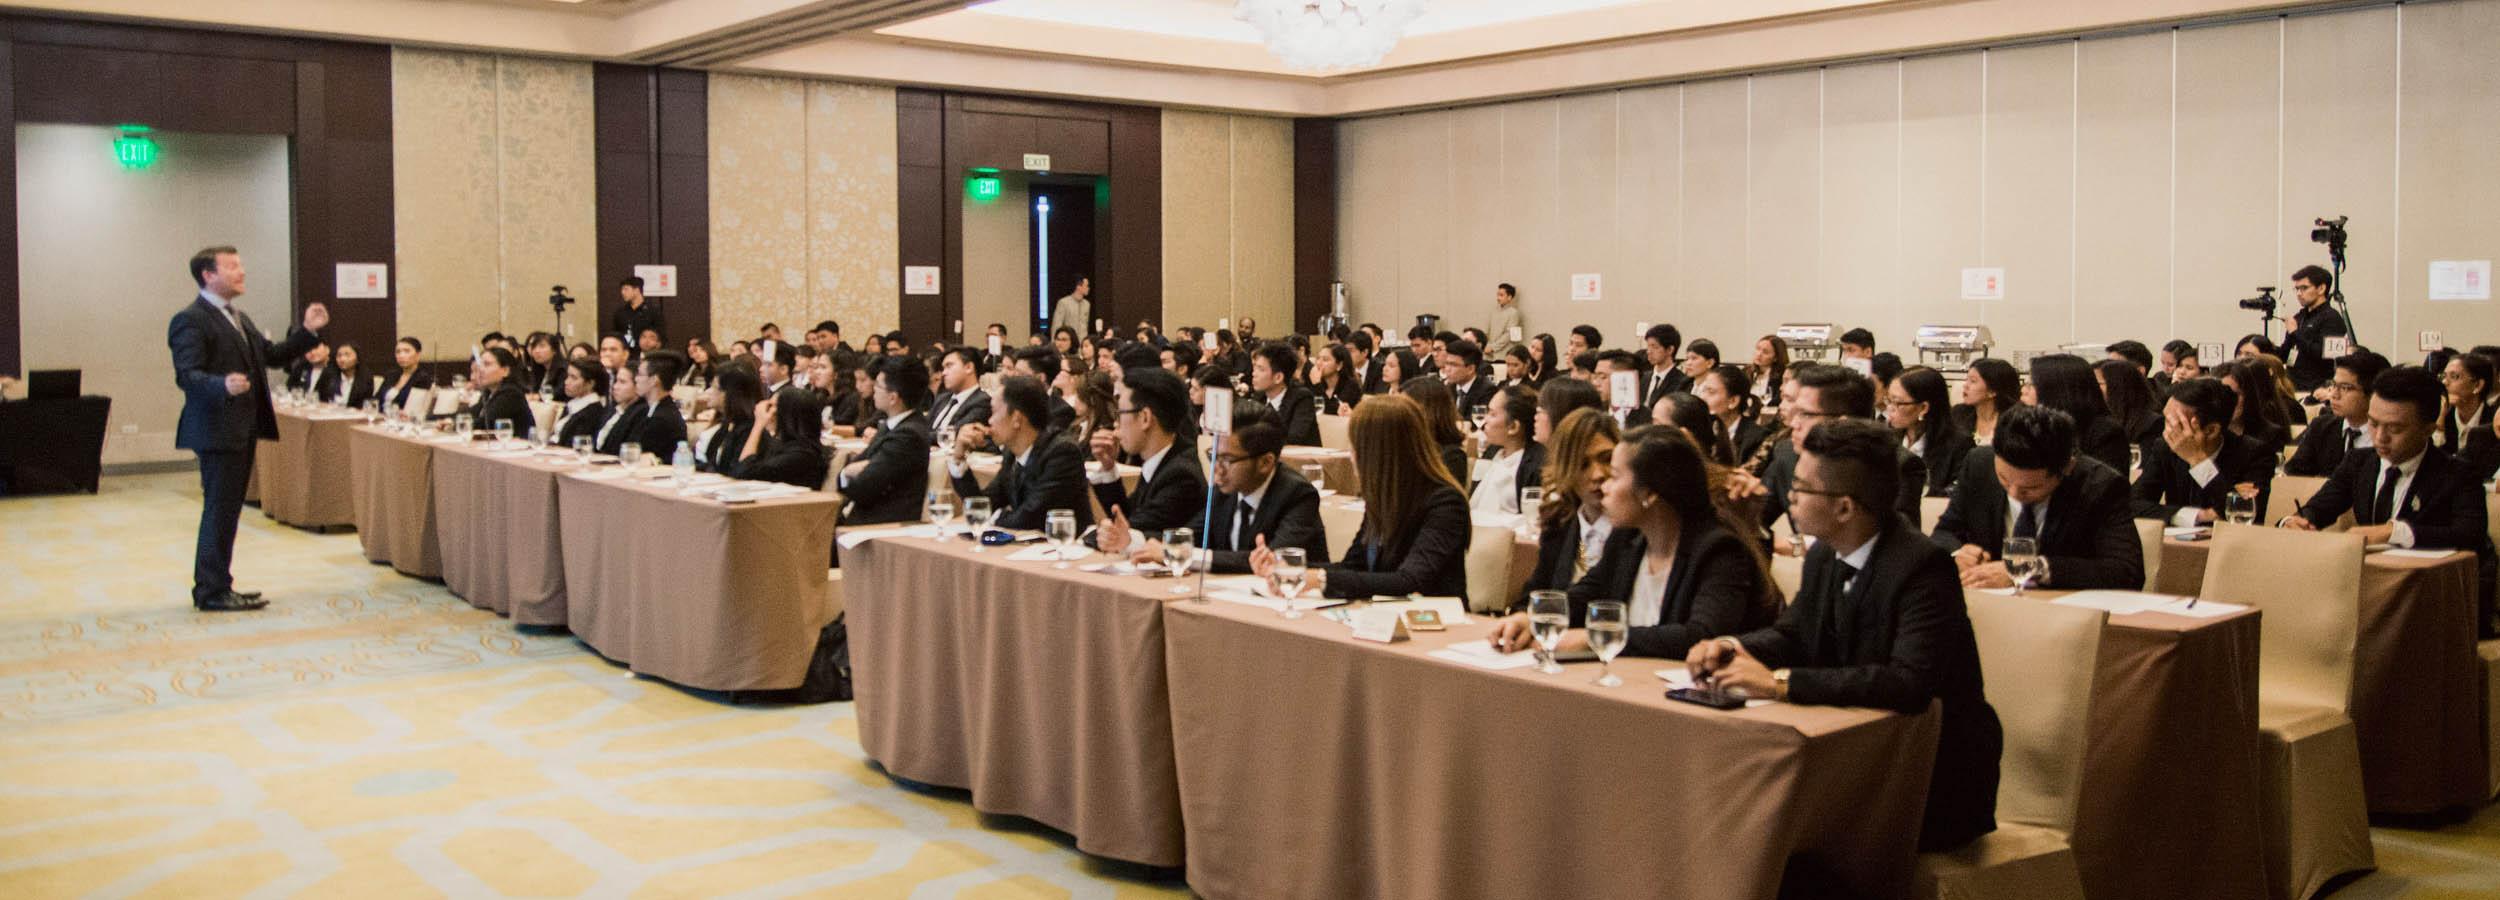 Appco Group Asia